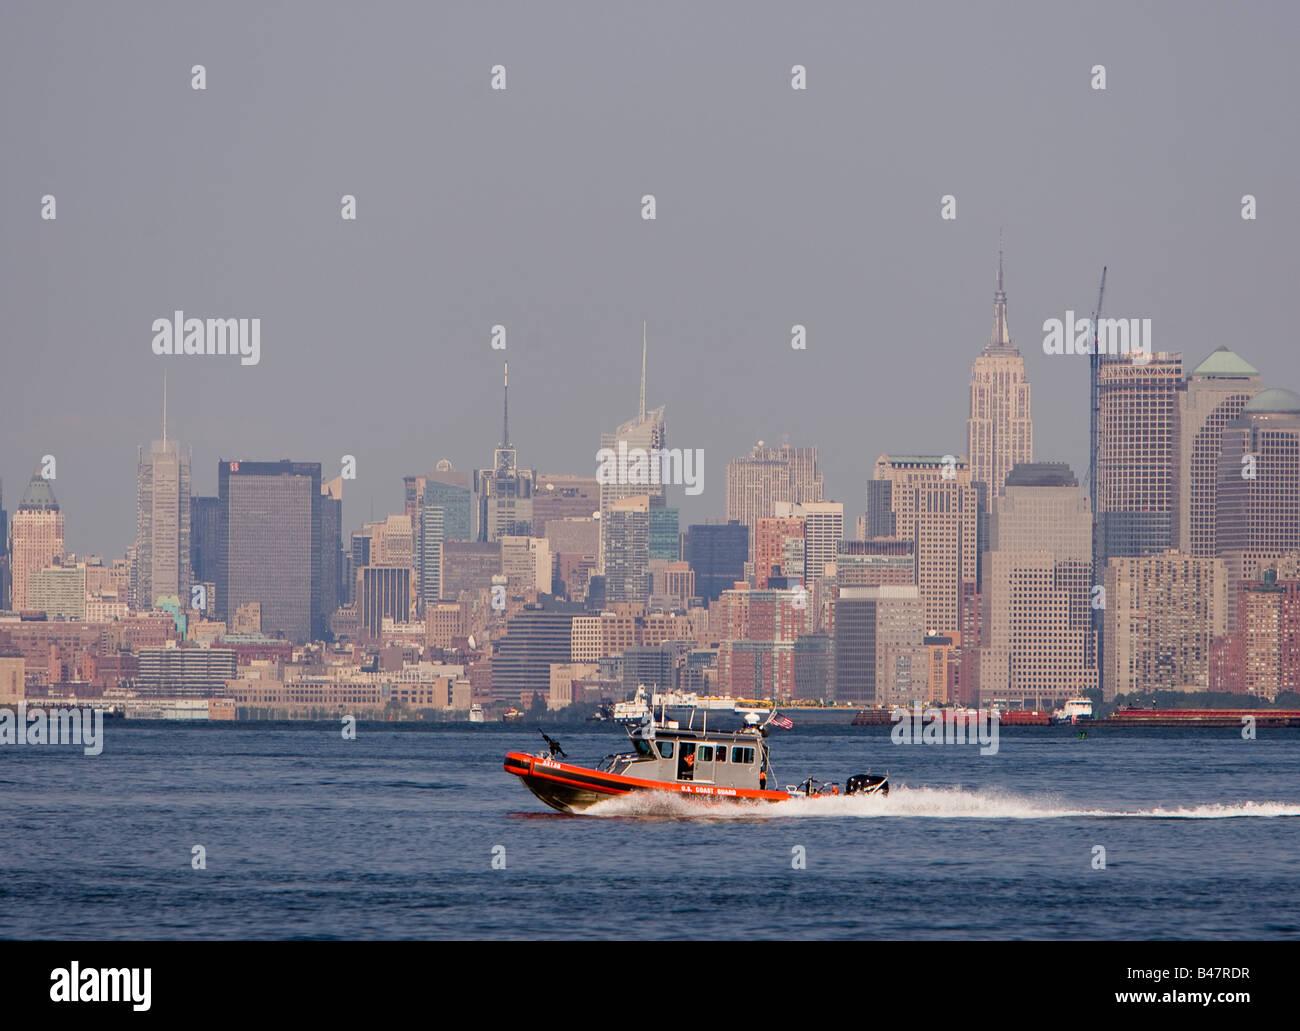 US Coast Guard patrolling New York Harbor - Stock Image